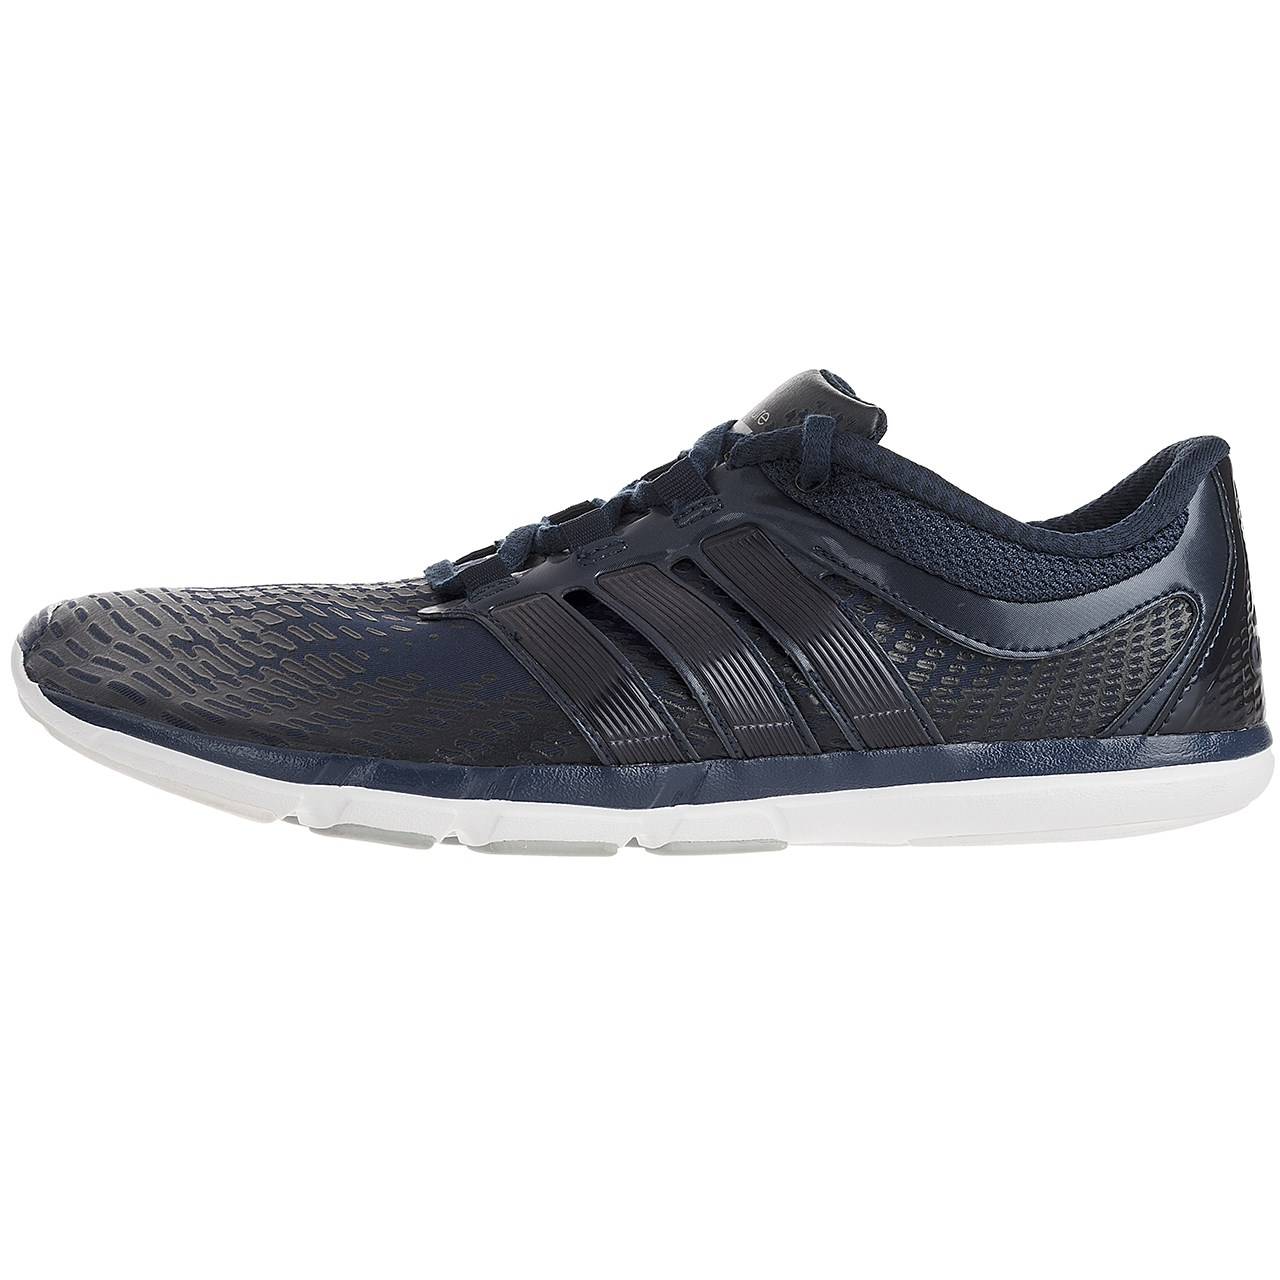 new products 1c756 134bf تصویر کوچک کفش مخصوص دويدن مردانه آديداس مدل Adipure Gazelle 2 Adidas  Adipure Gazelle 2 Running